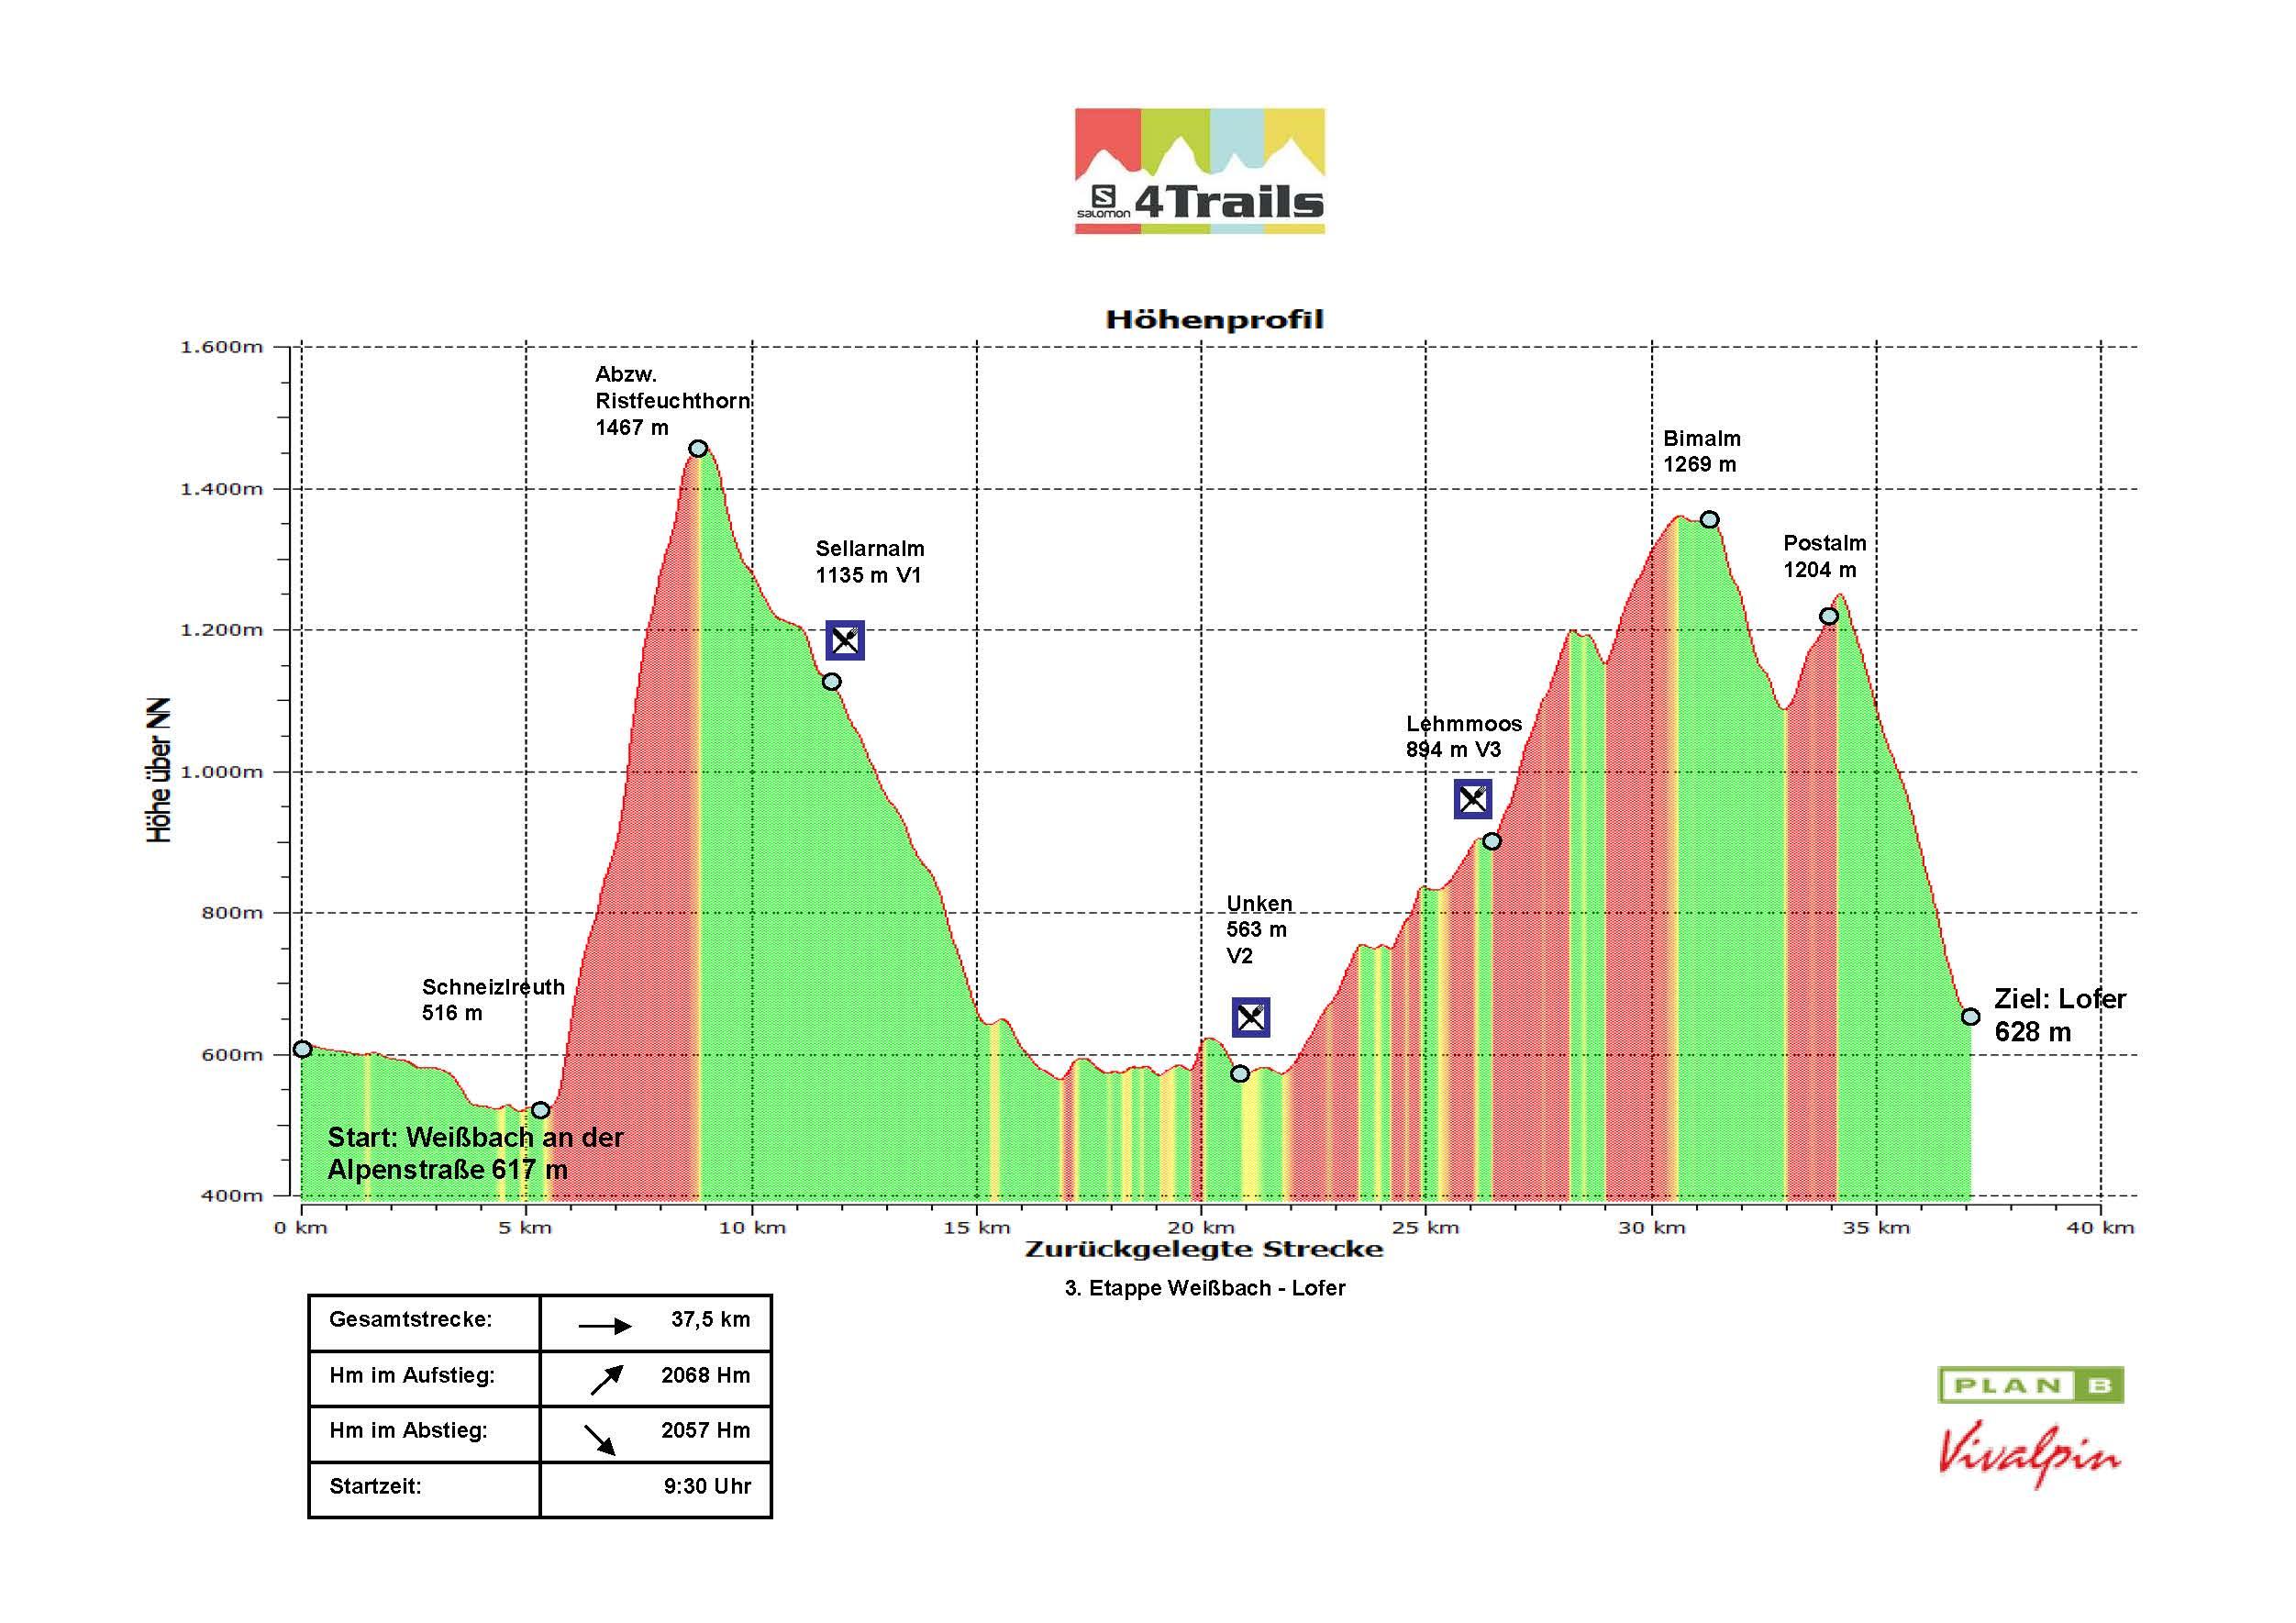 S4T Etappe 3 Höhenprofil